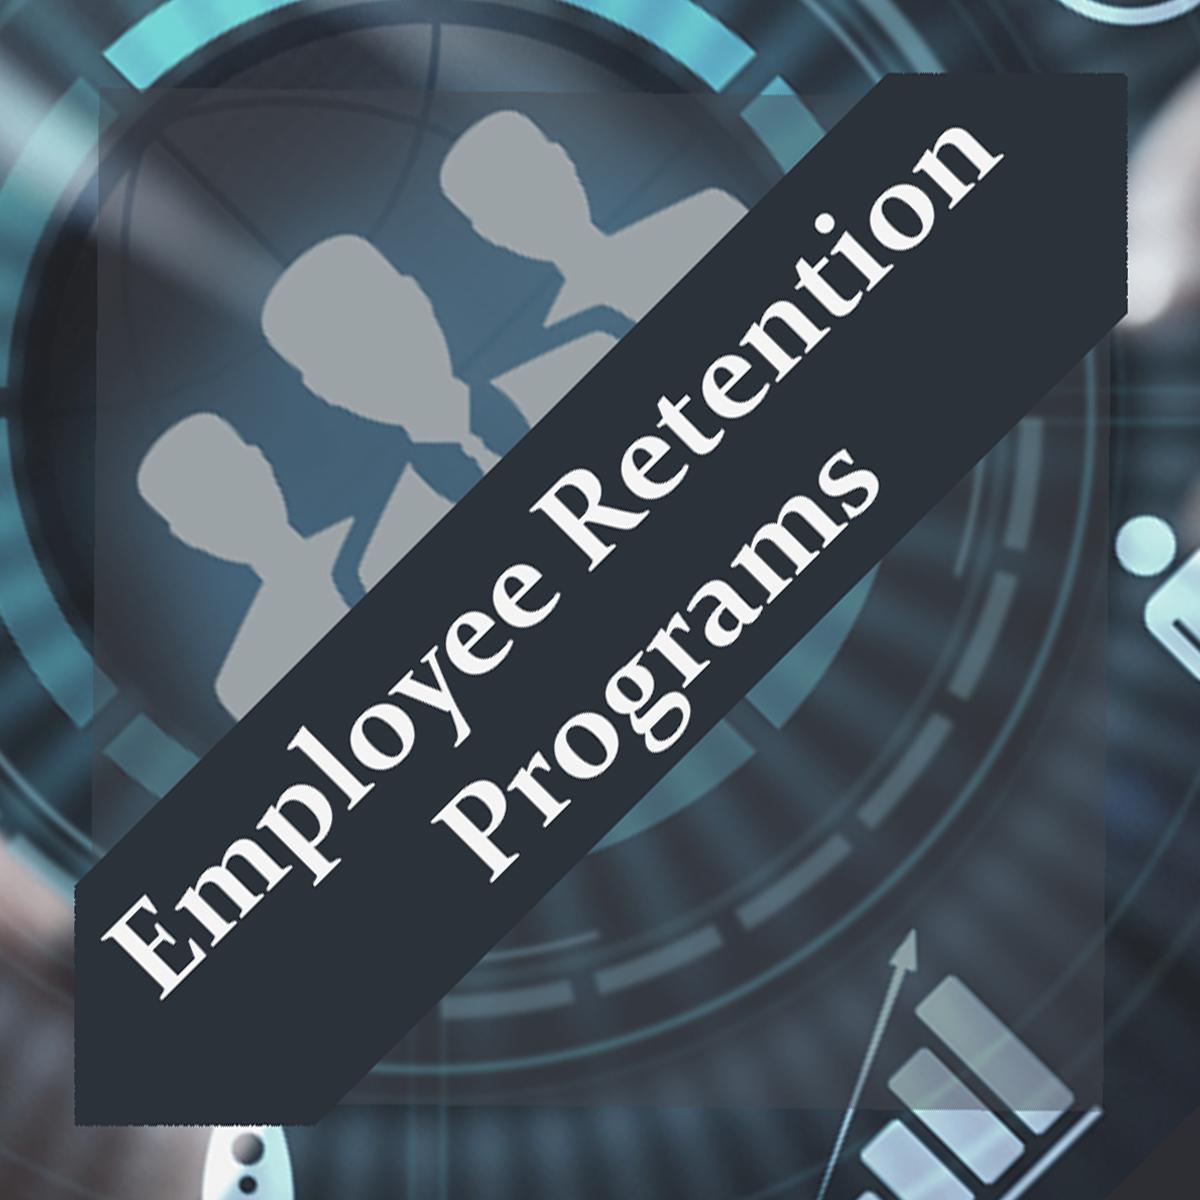 Employee Retention Strategies and Programs